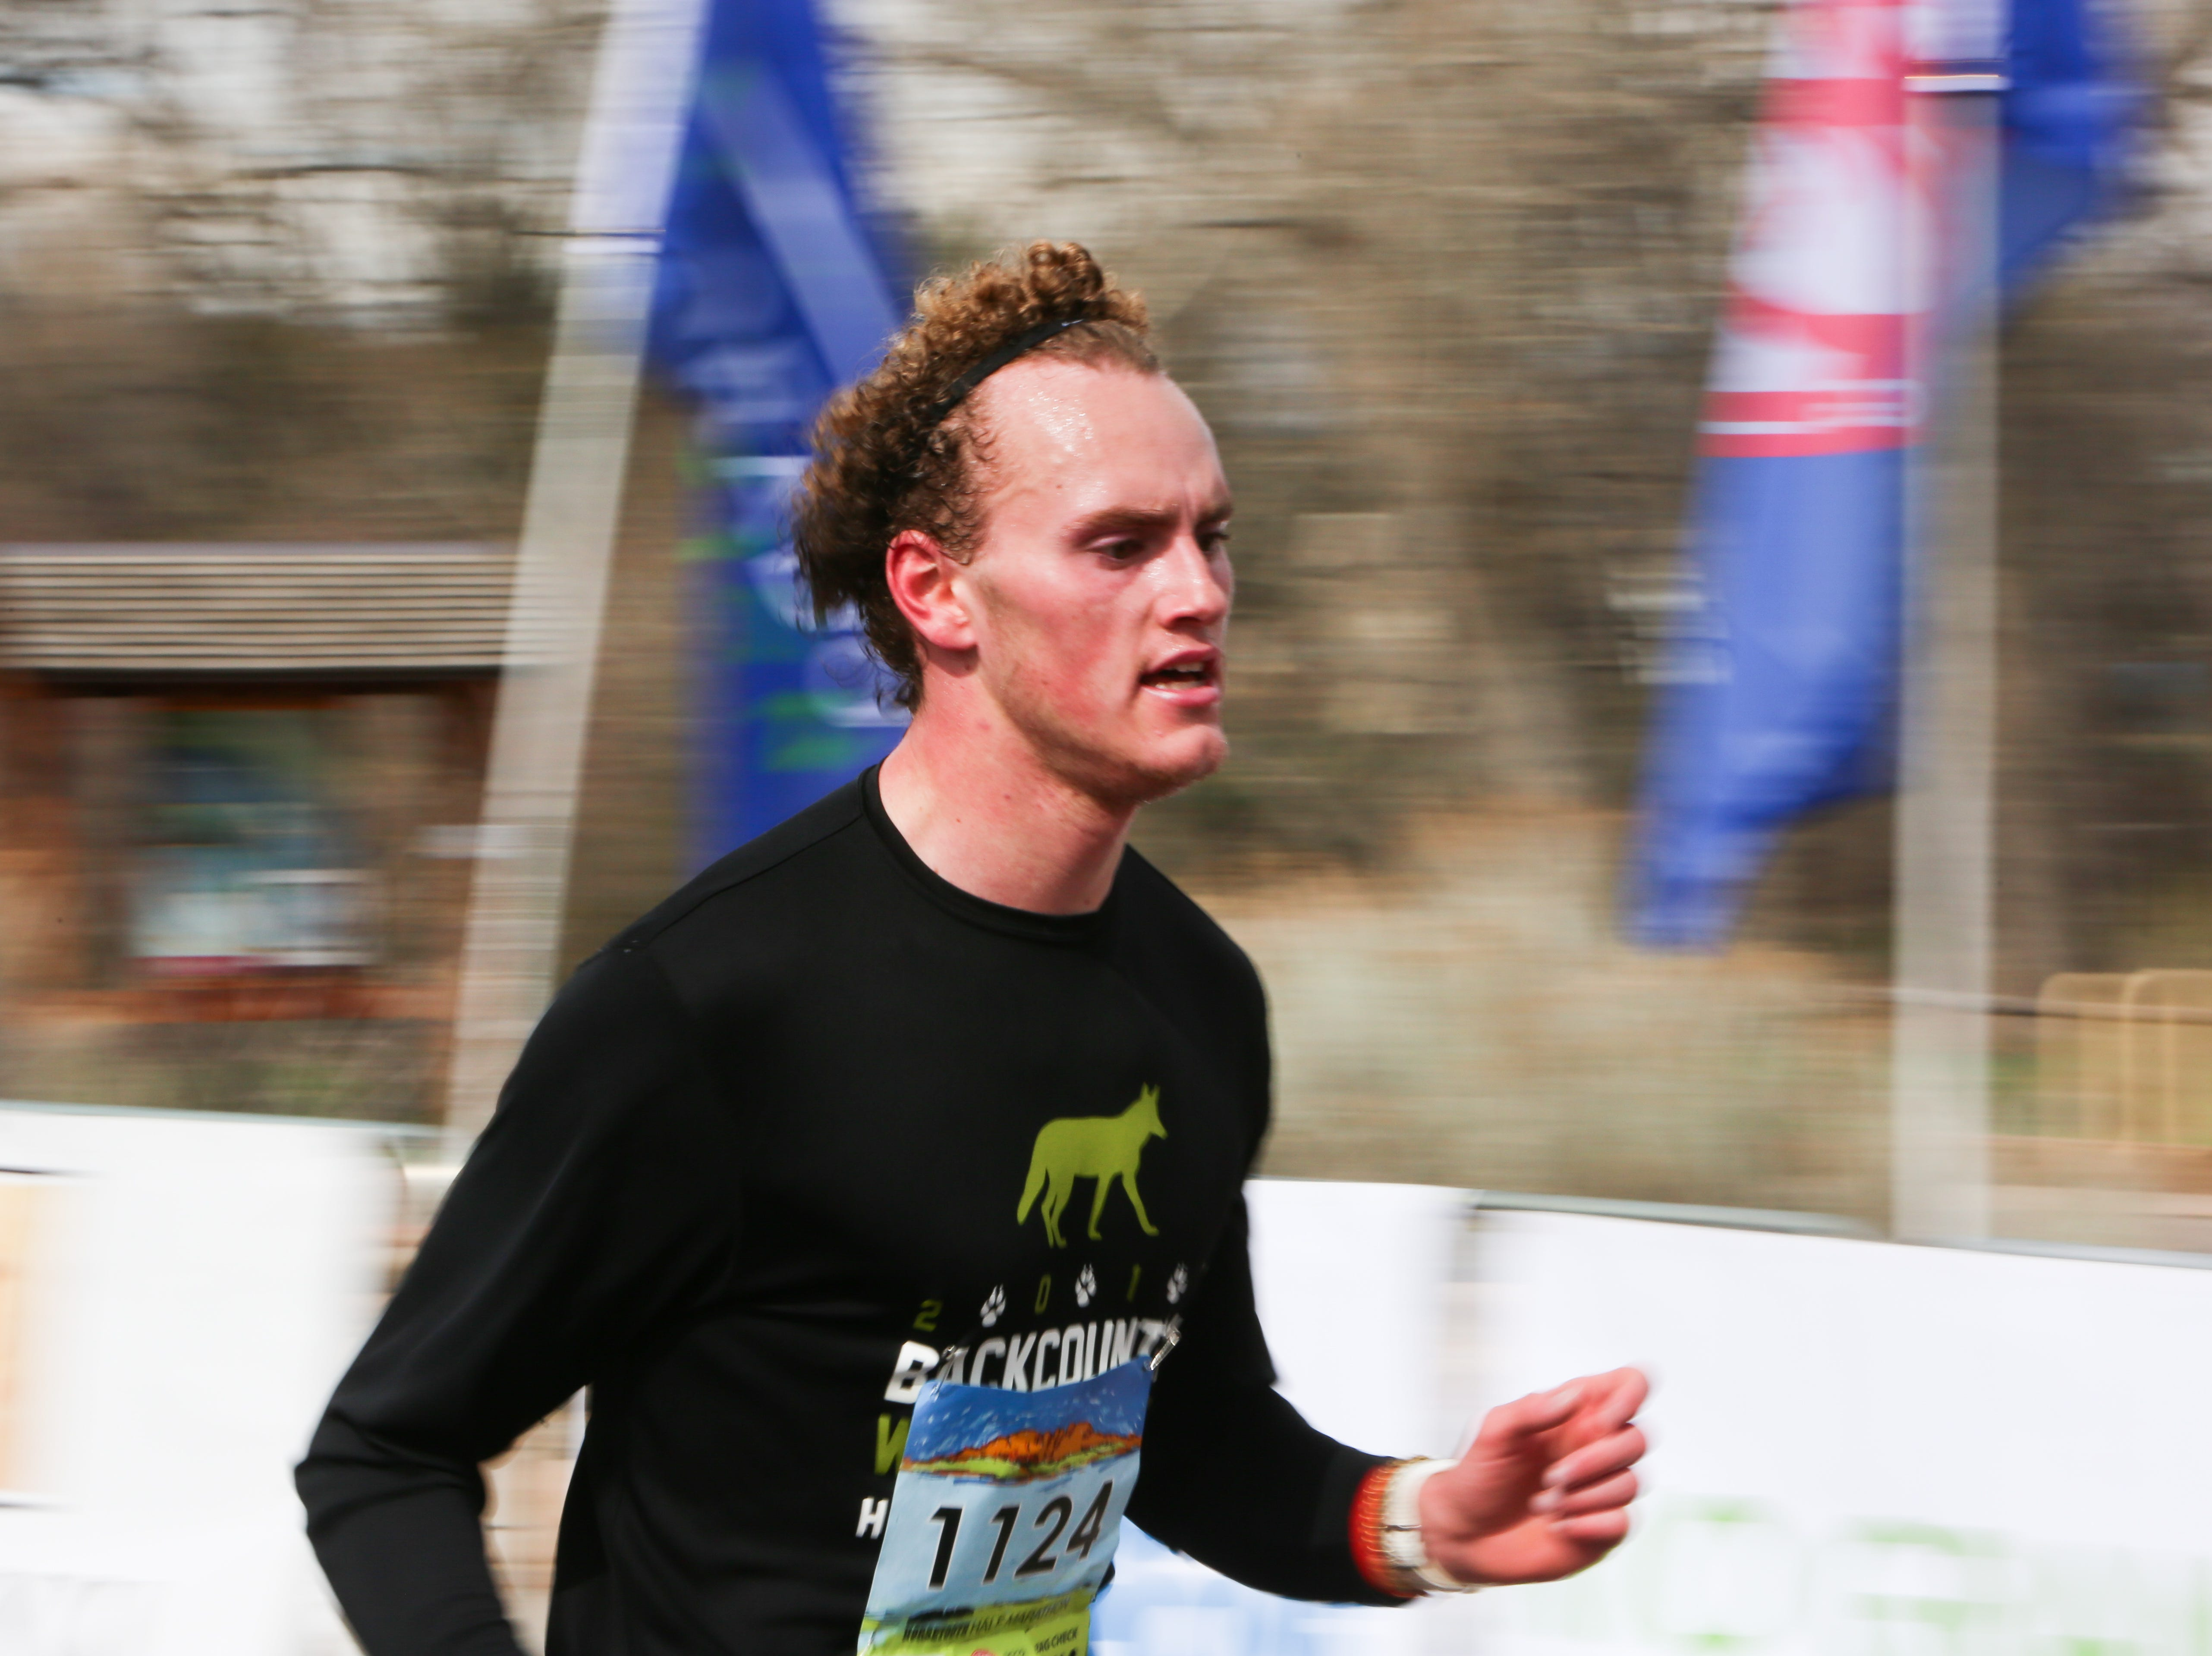 Jack Chambers finishes the Horsetooth Half Marathon on April 14